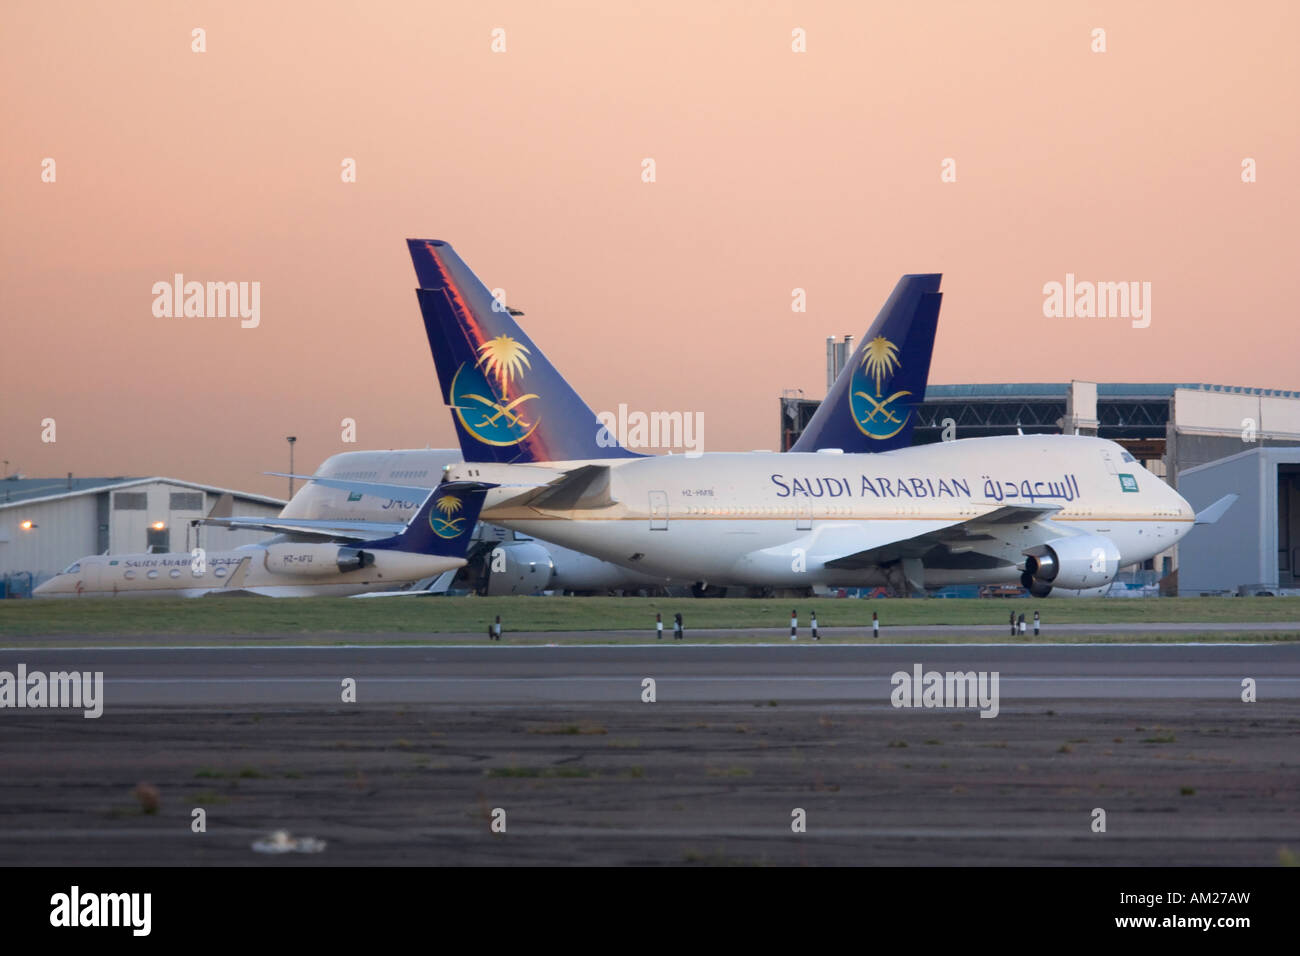 Fleet of Saudi Arabian goverment at London Heathrow Airport UK - Stock Image